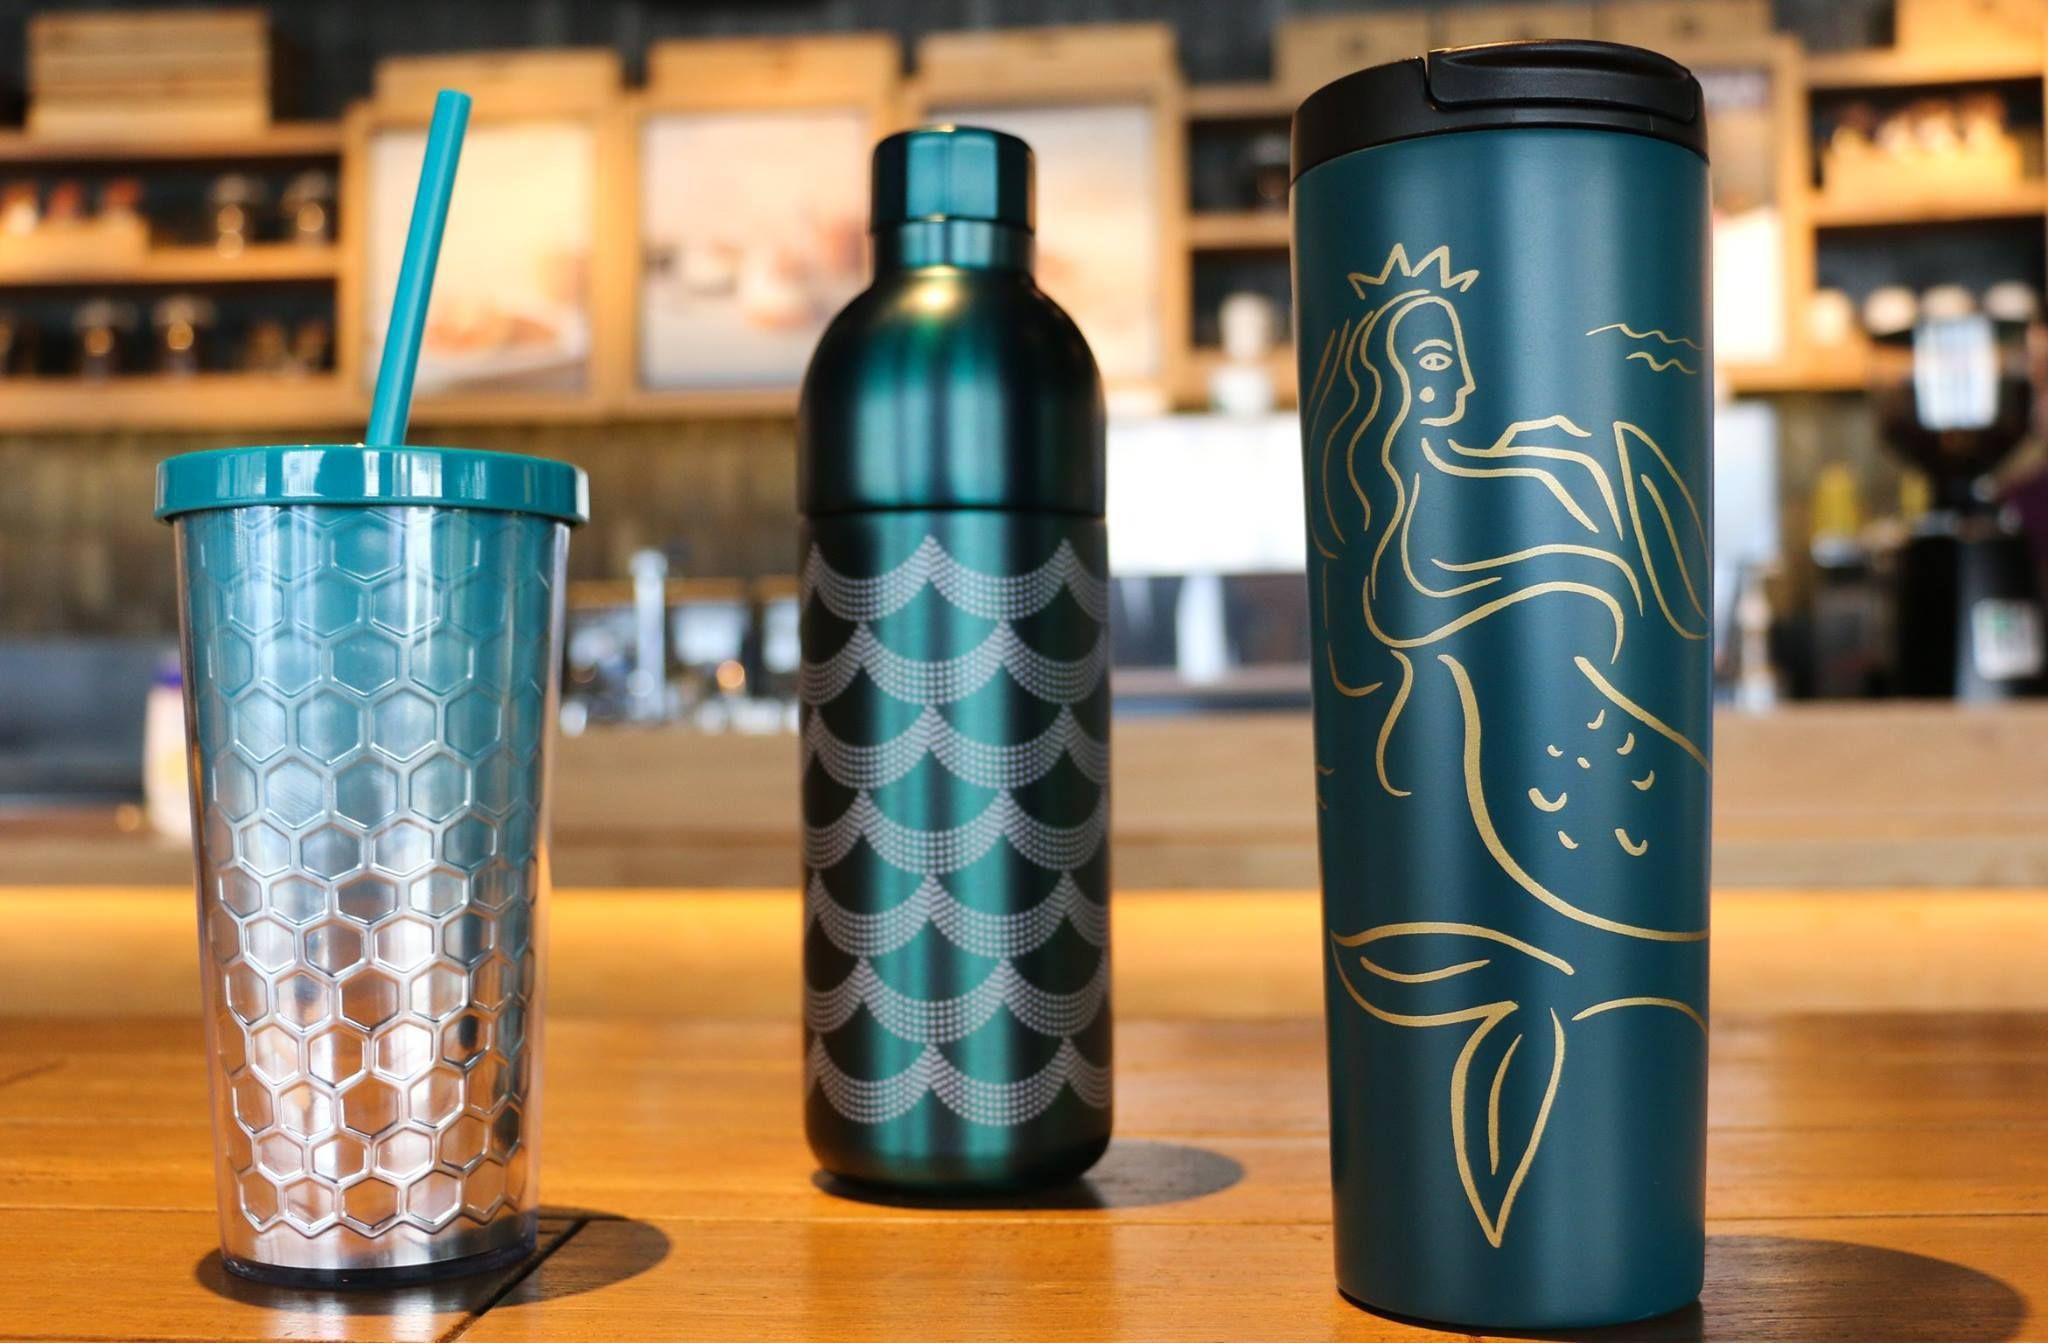 763874013dc Starbucks Philippines Mermaid Tumblers: The Anniversary Collection – Typist  PH